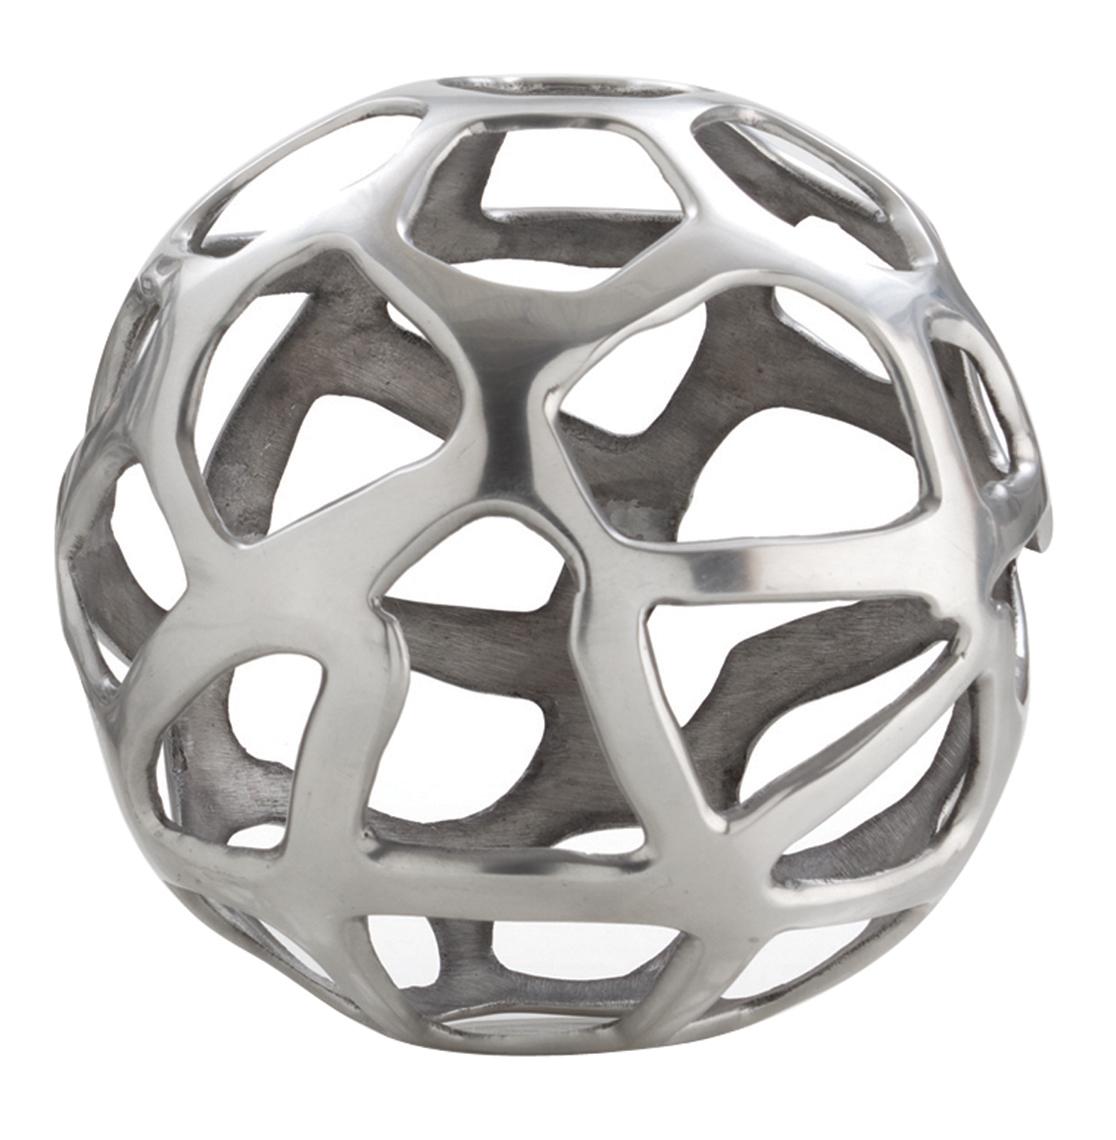 Ennis Polished Nickel Web Sphere Sculpture Decor Object - 10 Inch